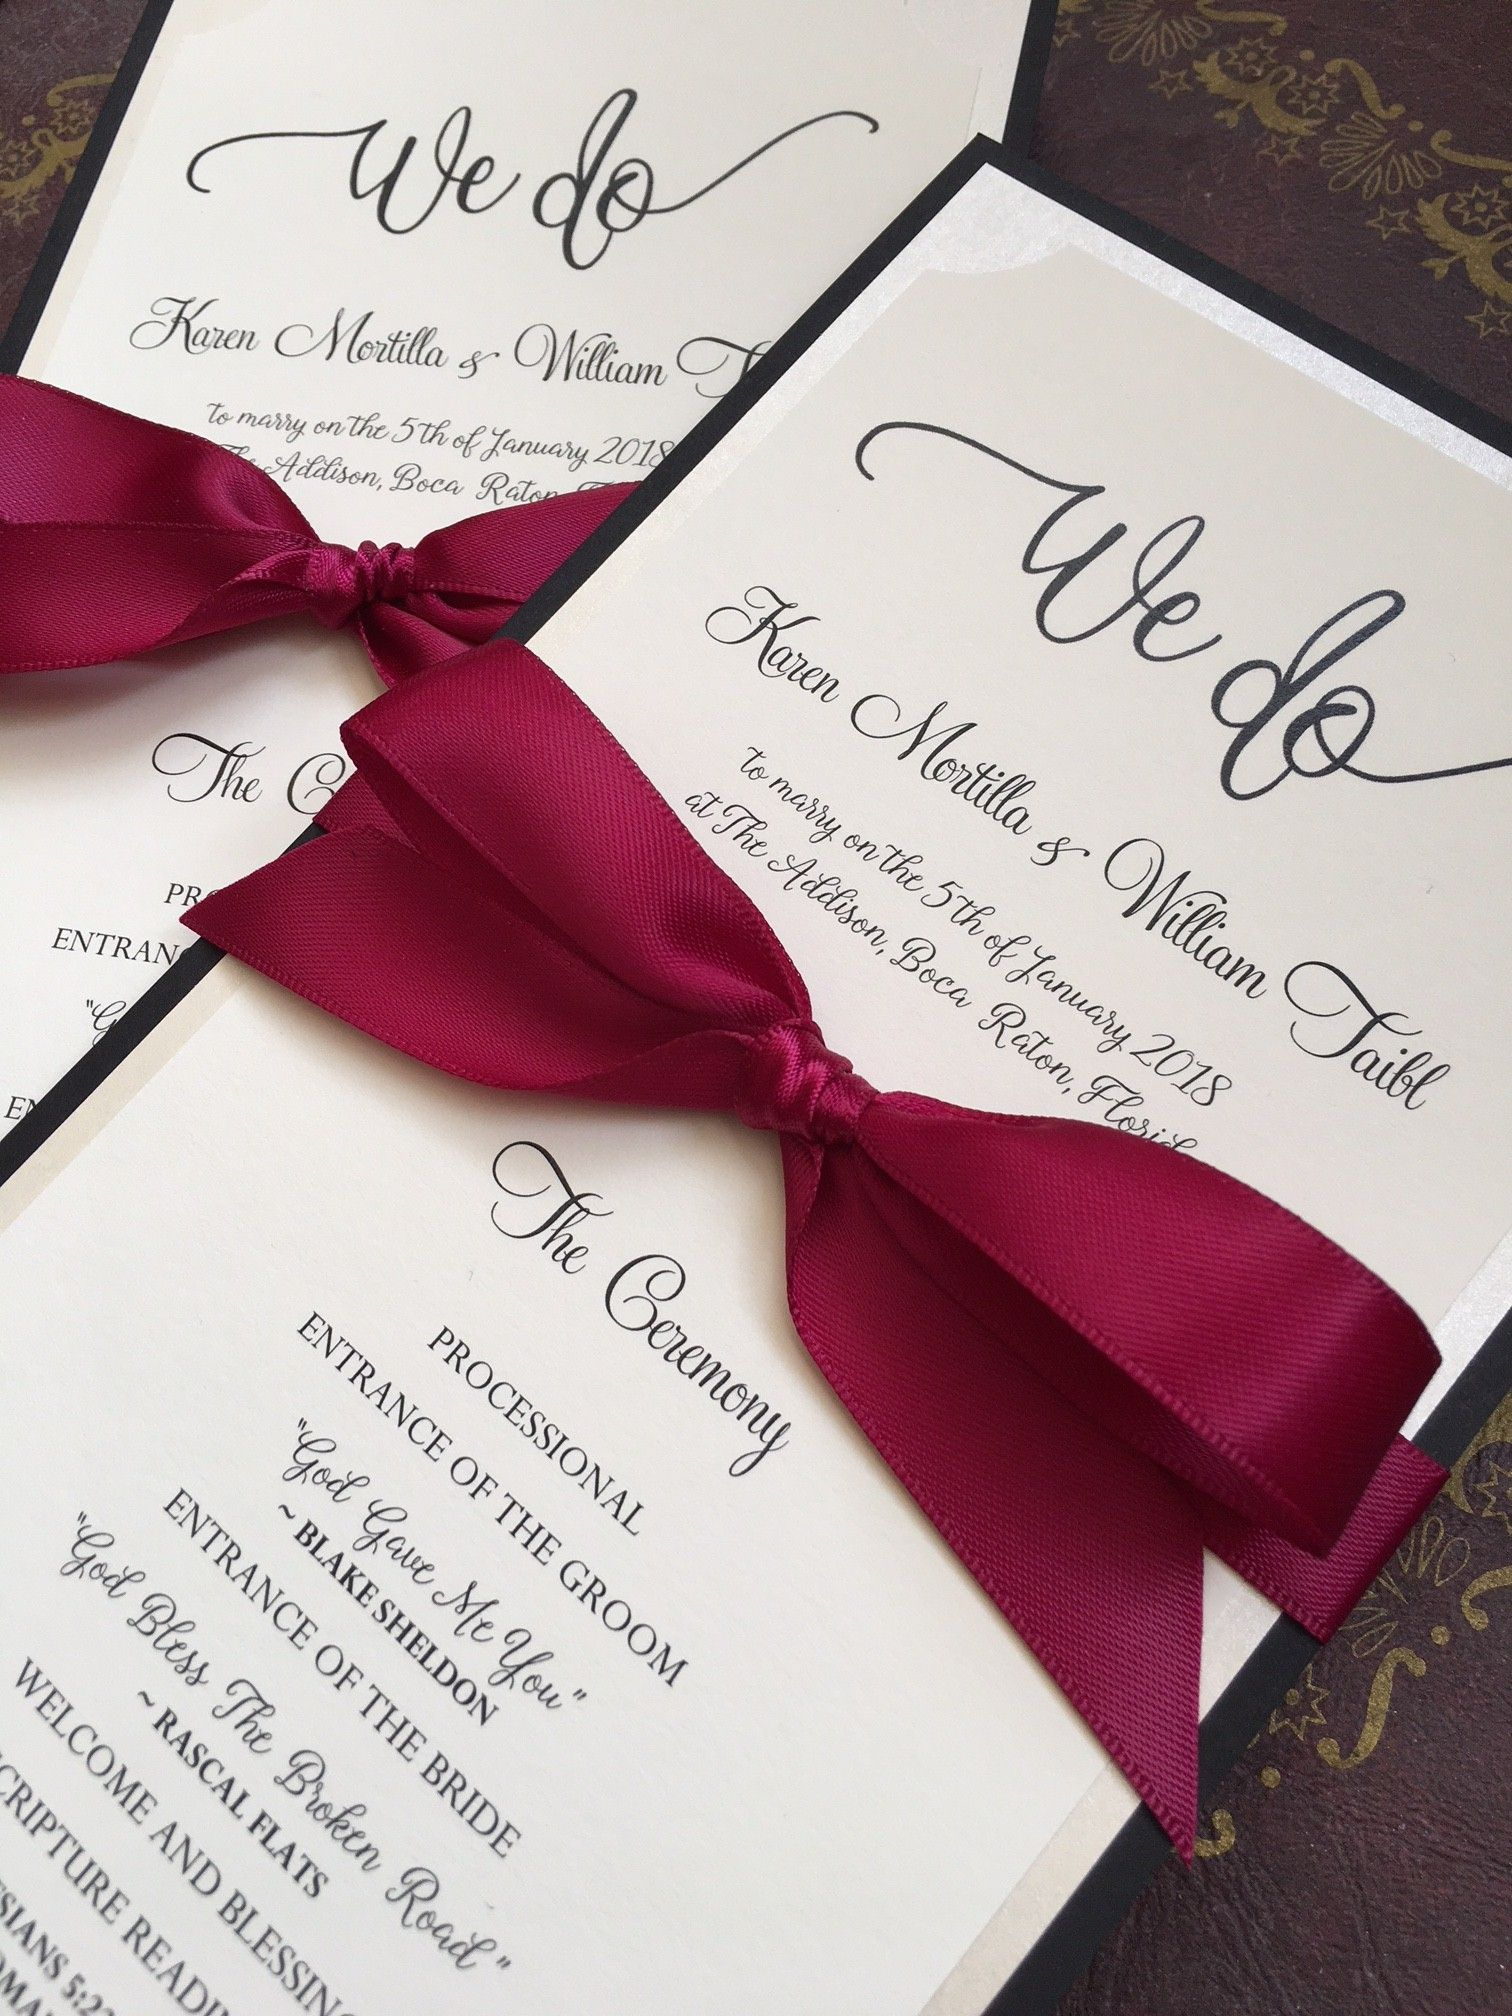 Karen & Bill\'s wedding programs in lush burgundy, champagne and ...